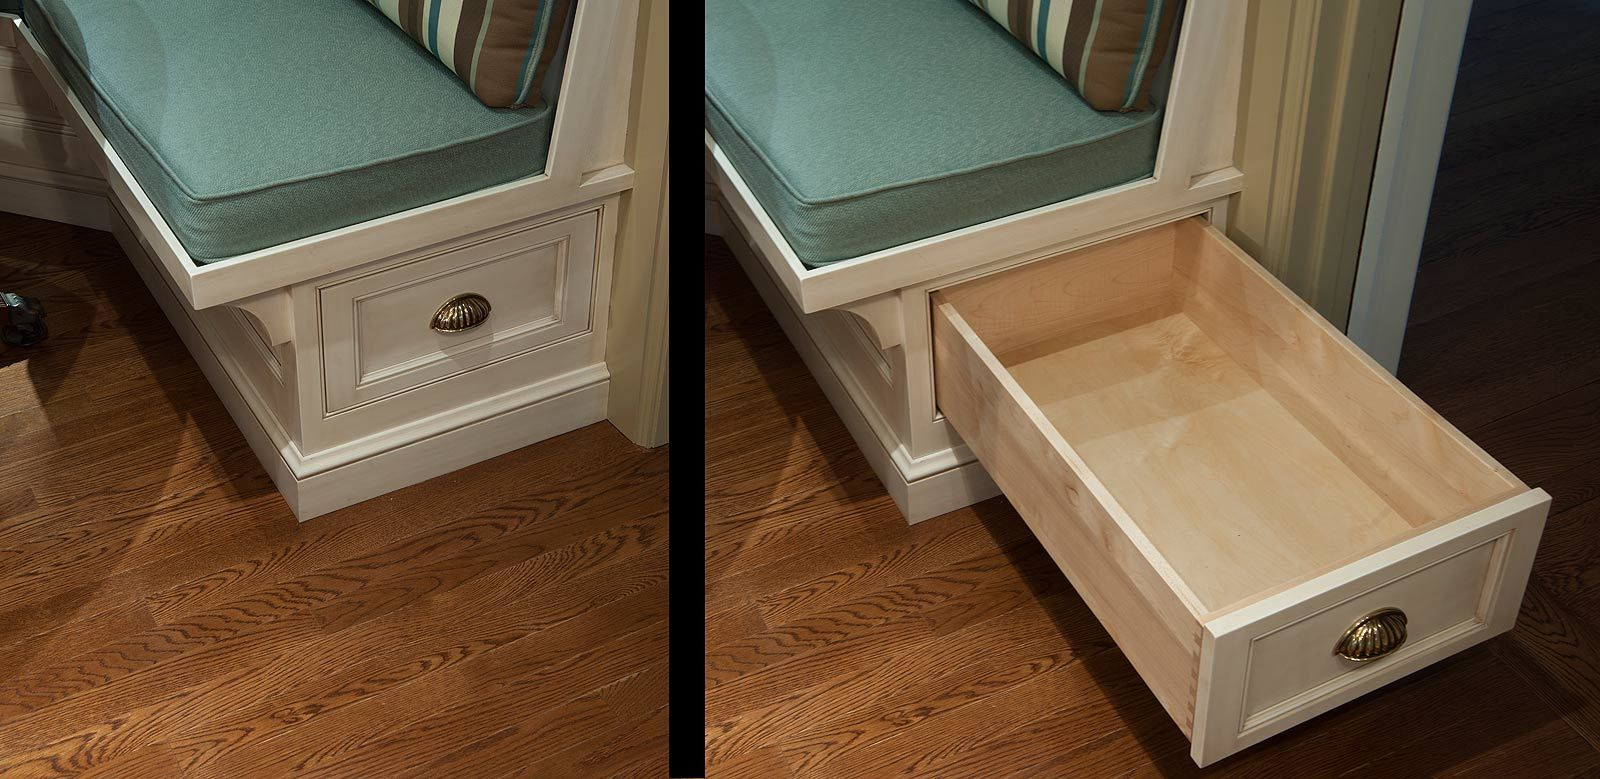 Custom Bench Seat With Storage Drawer